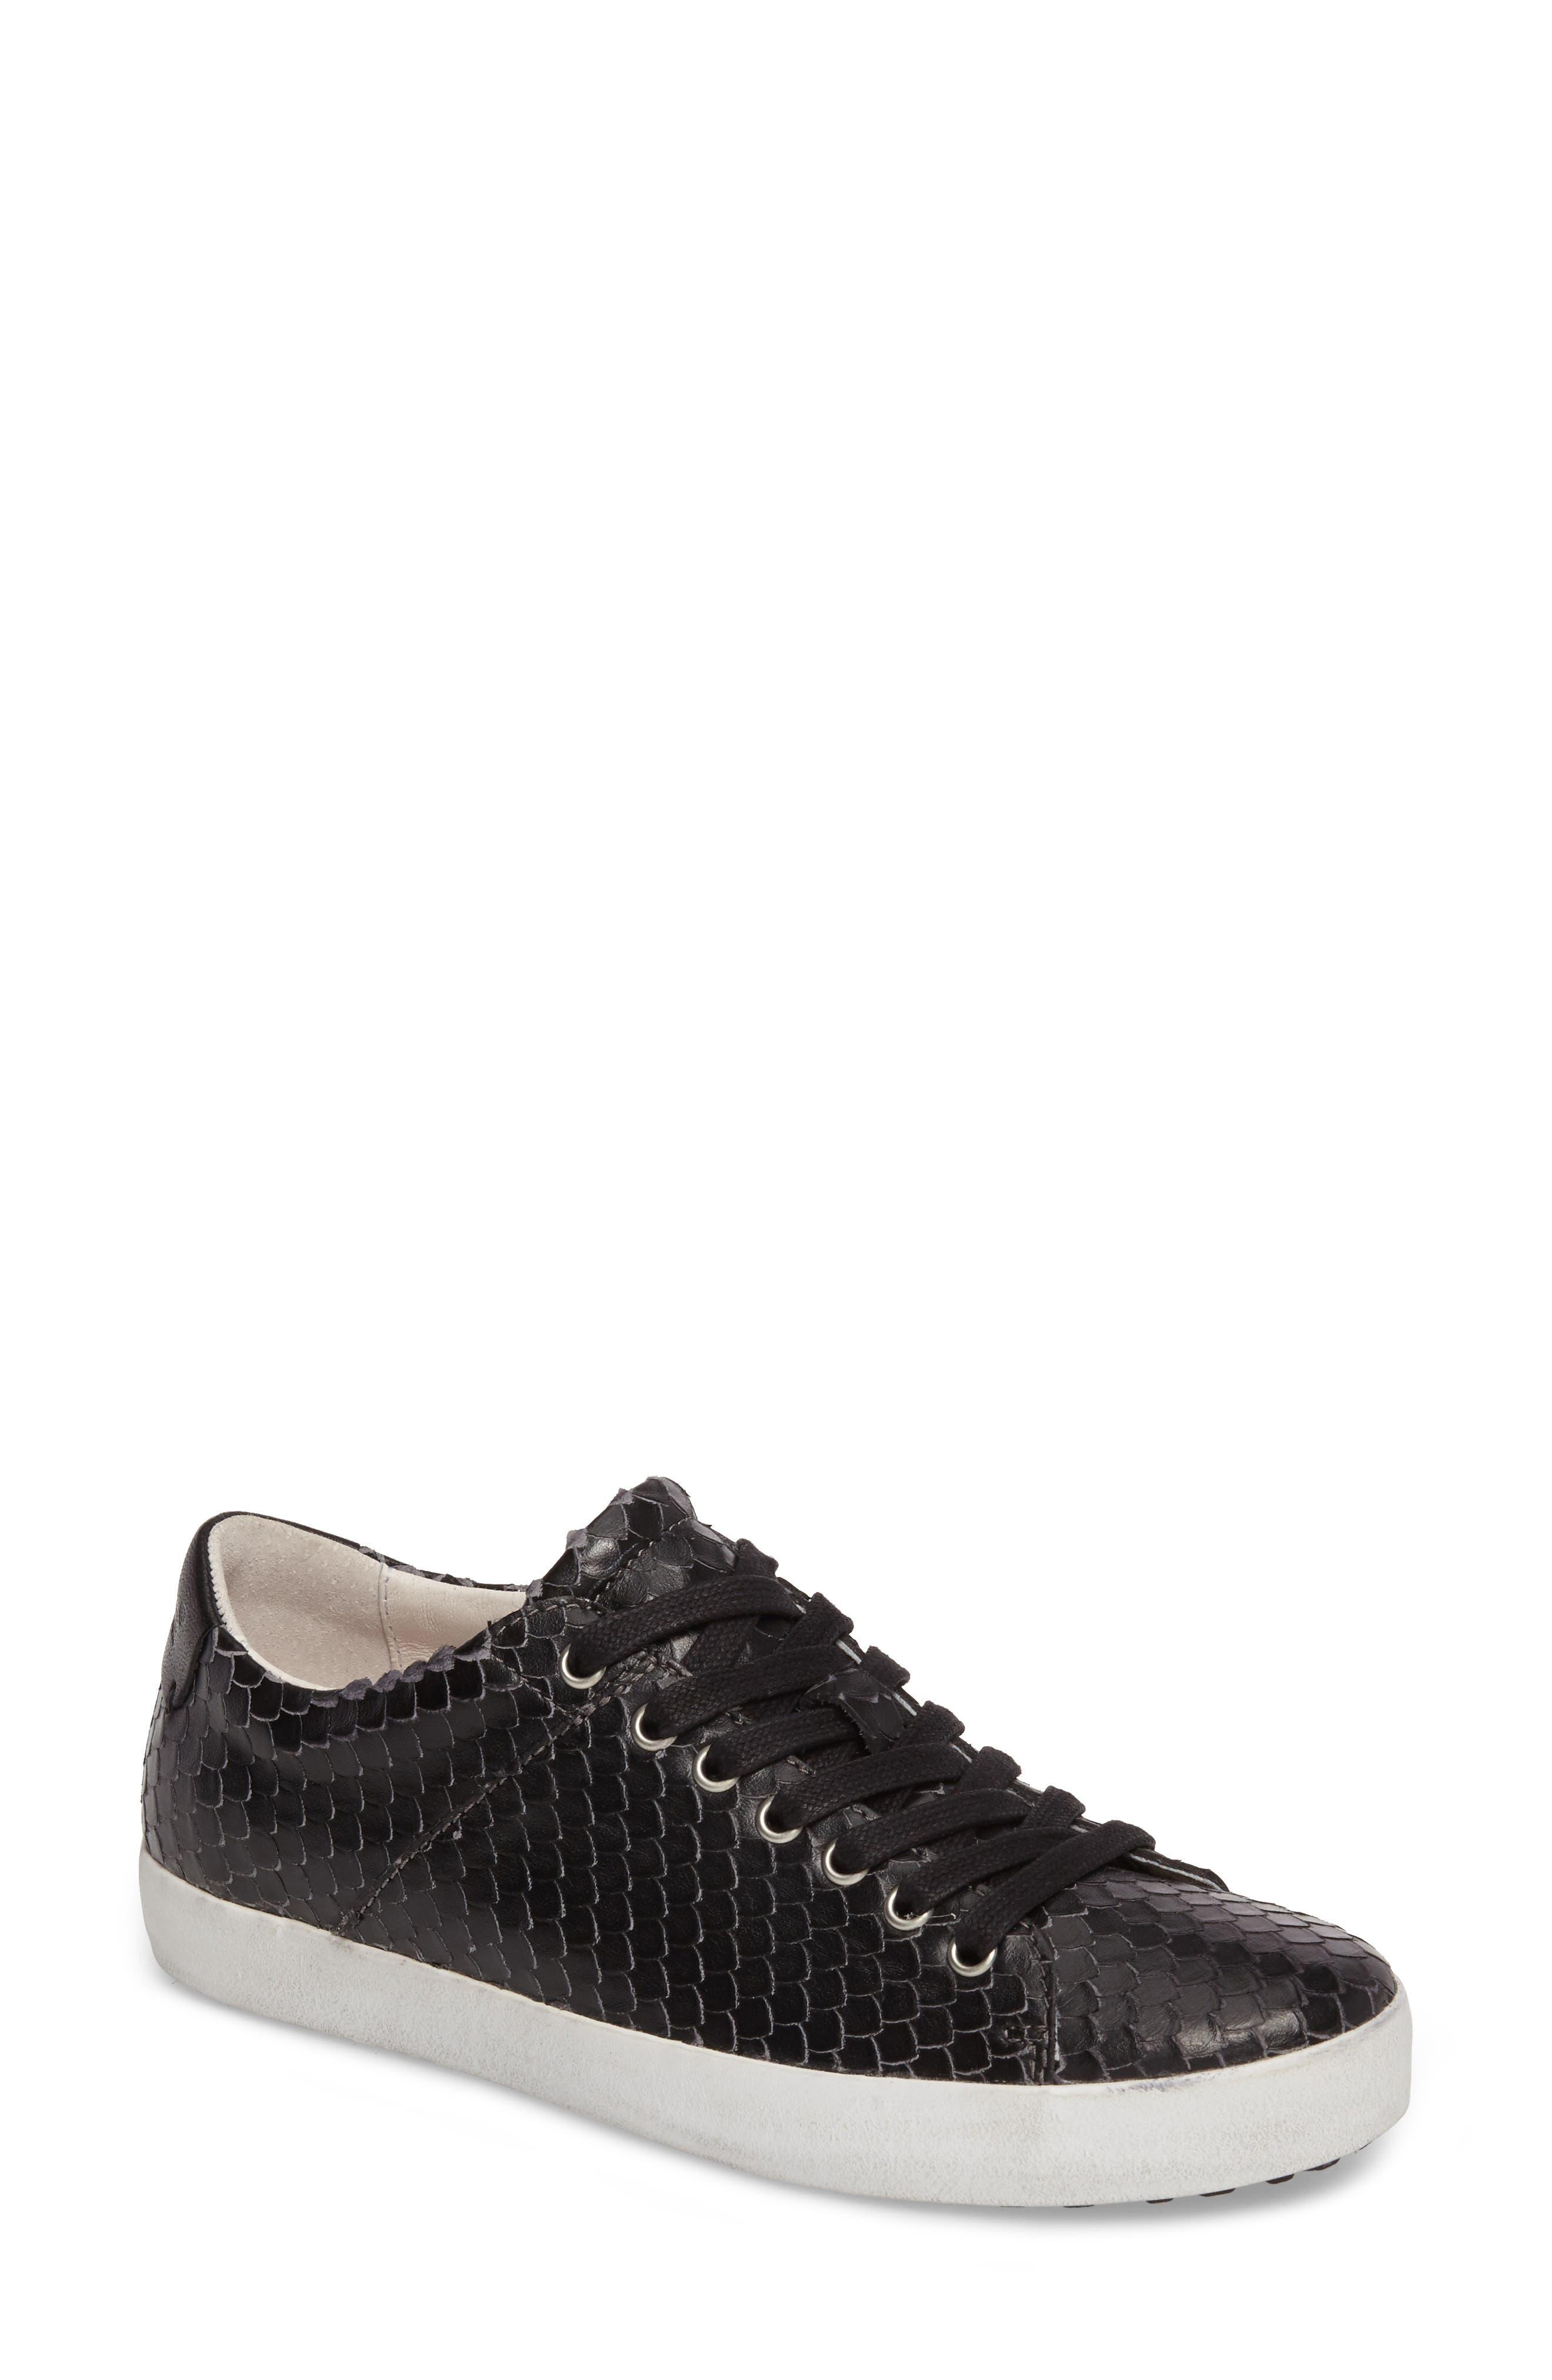 OL25 Sneaker,                         Main,                         color, BLACK LEATHER